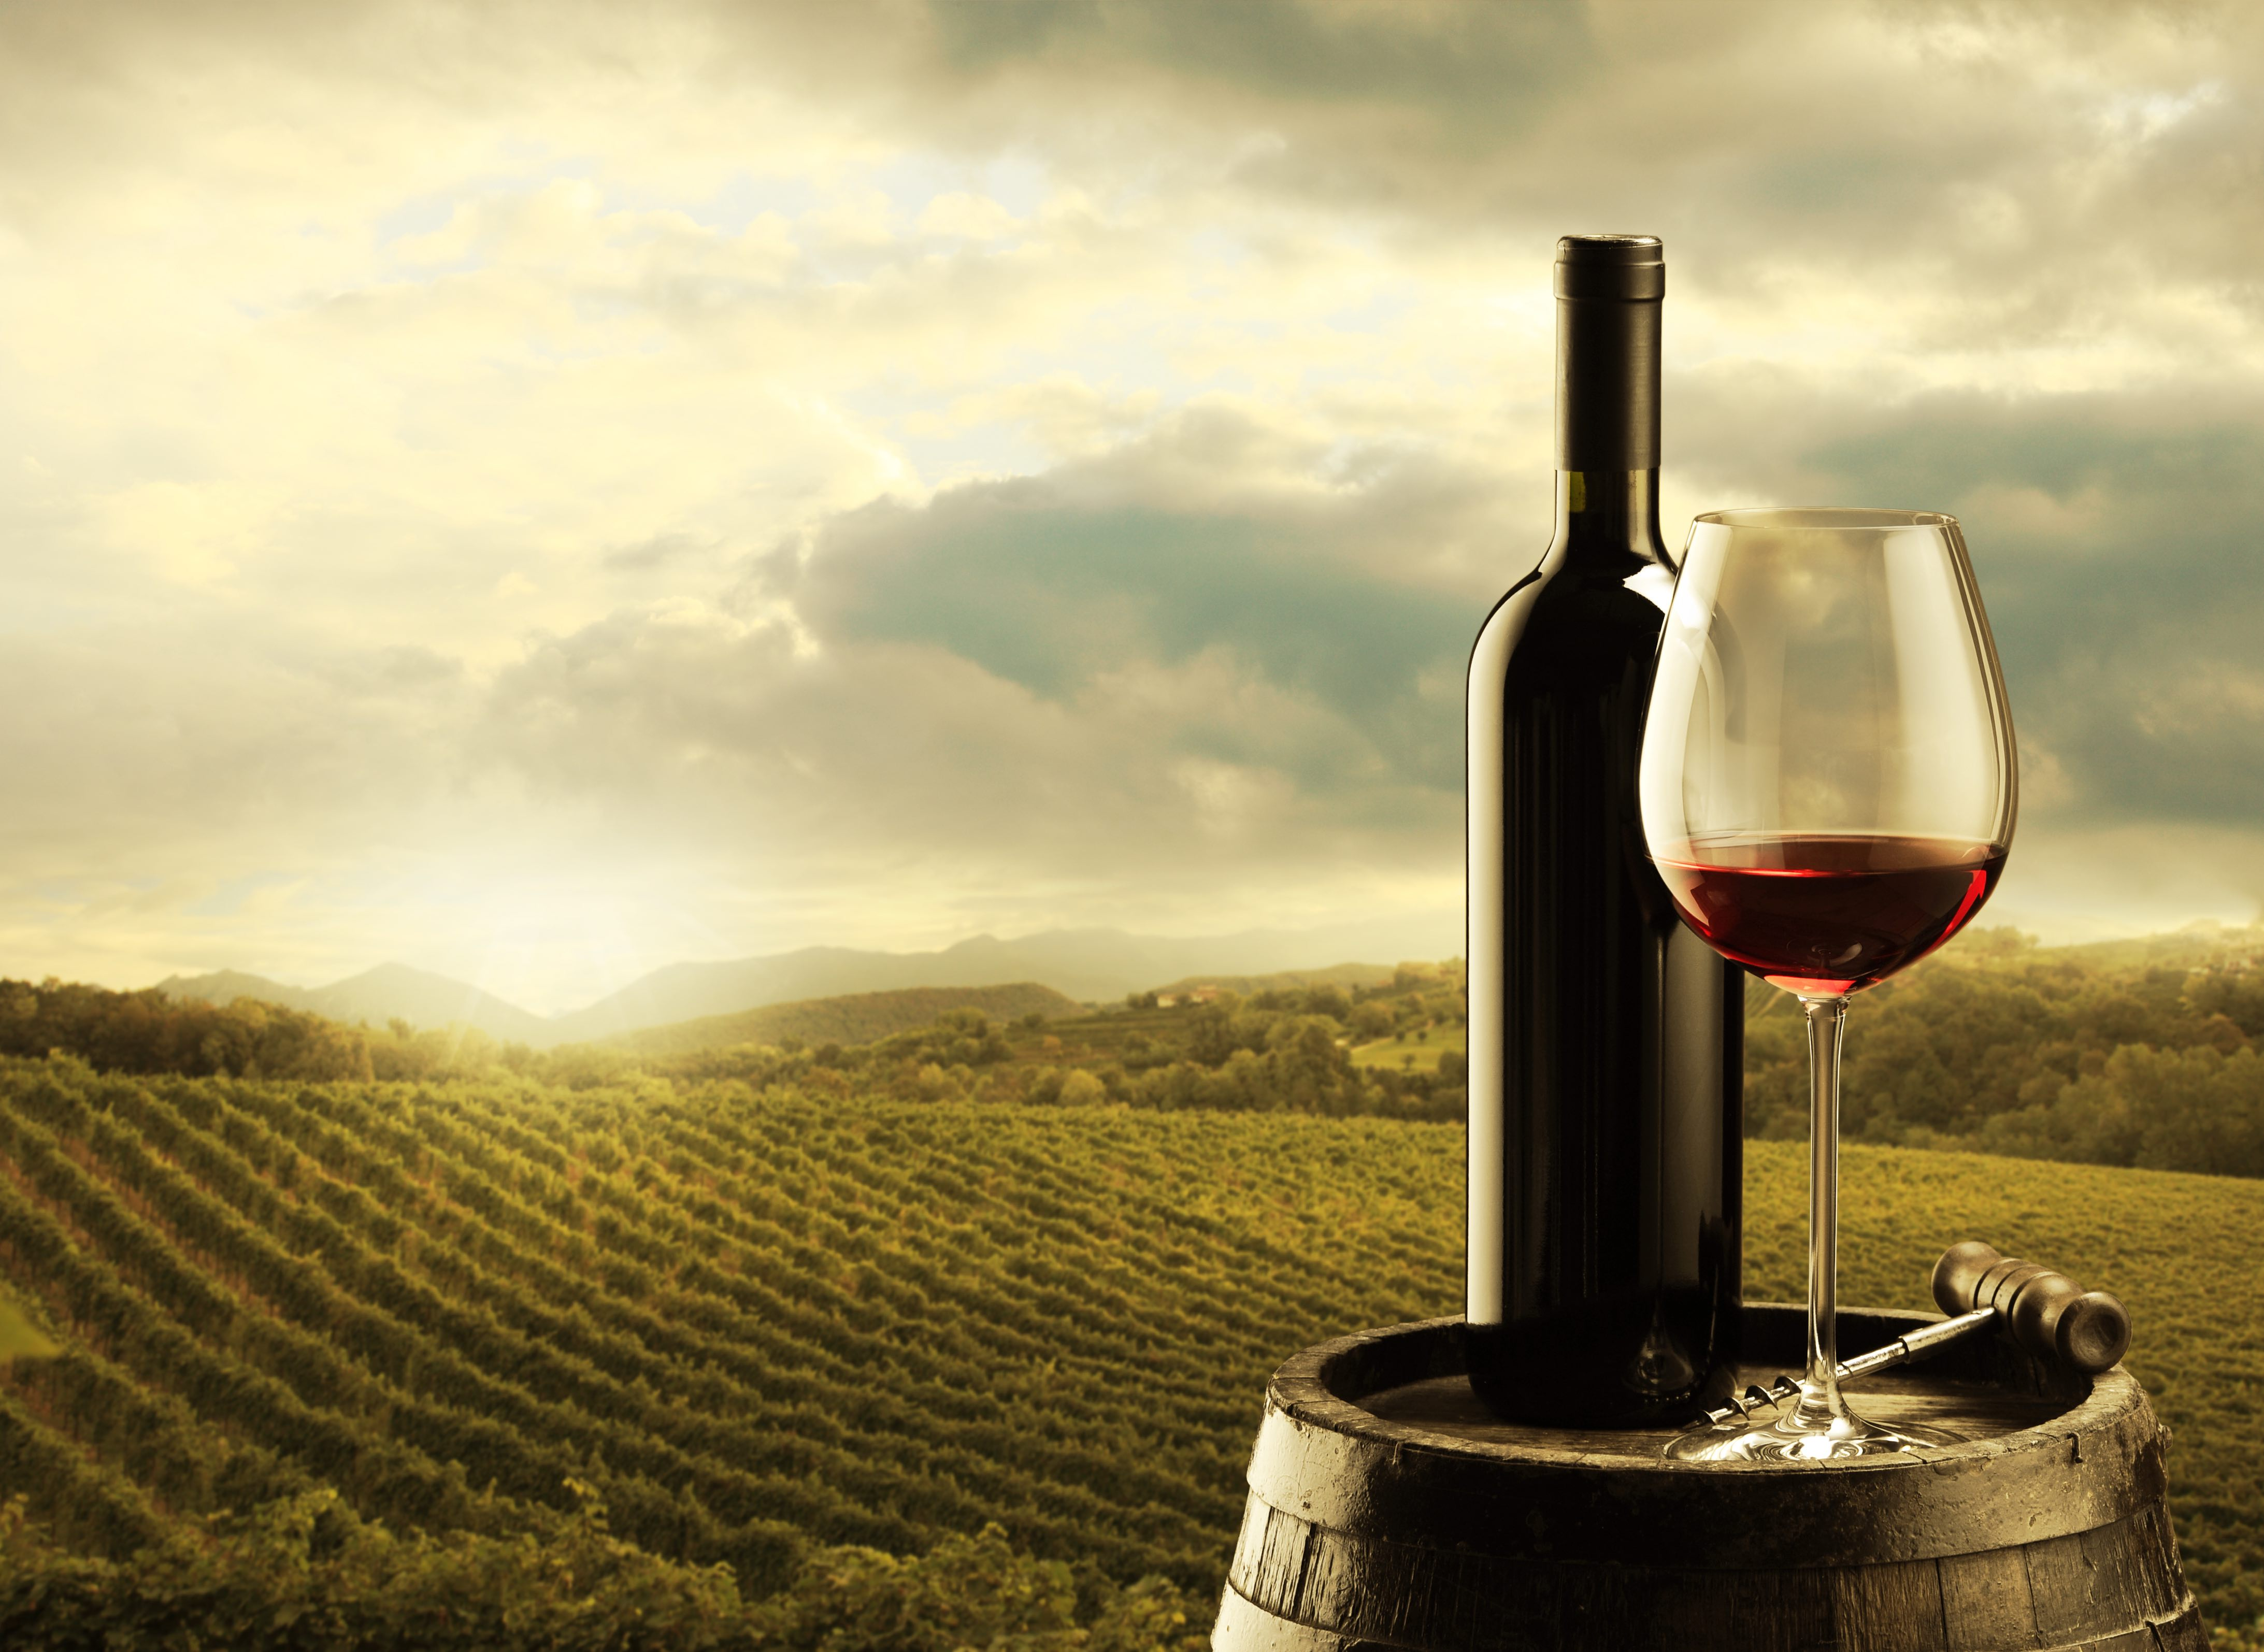 Concurs de vinuri